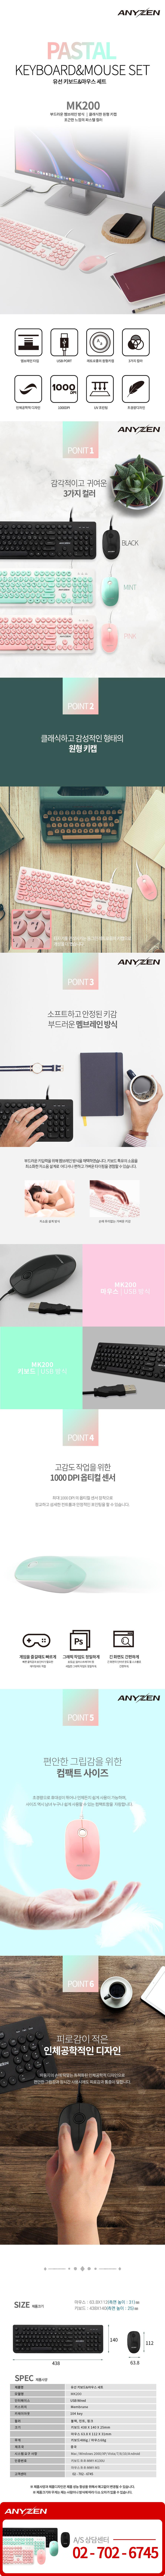 ANYZEN  MK200 유선 키보드 마우스 세트(민트)